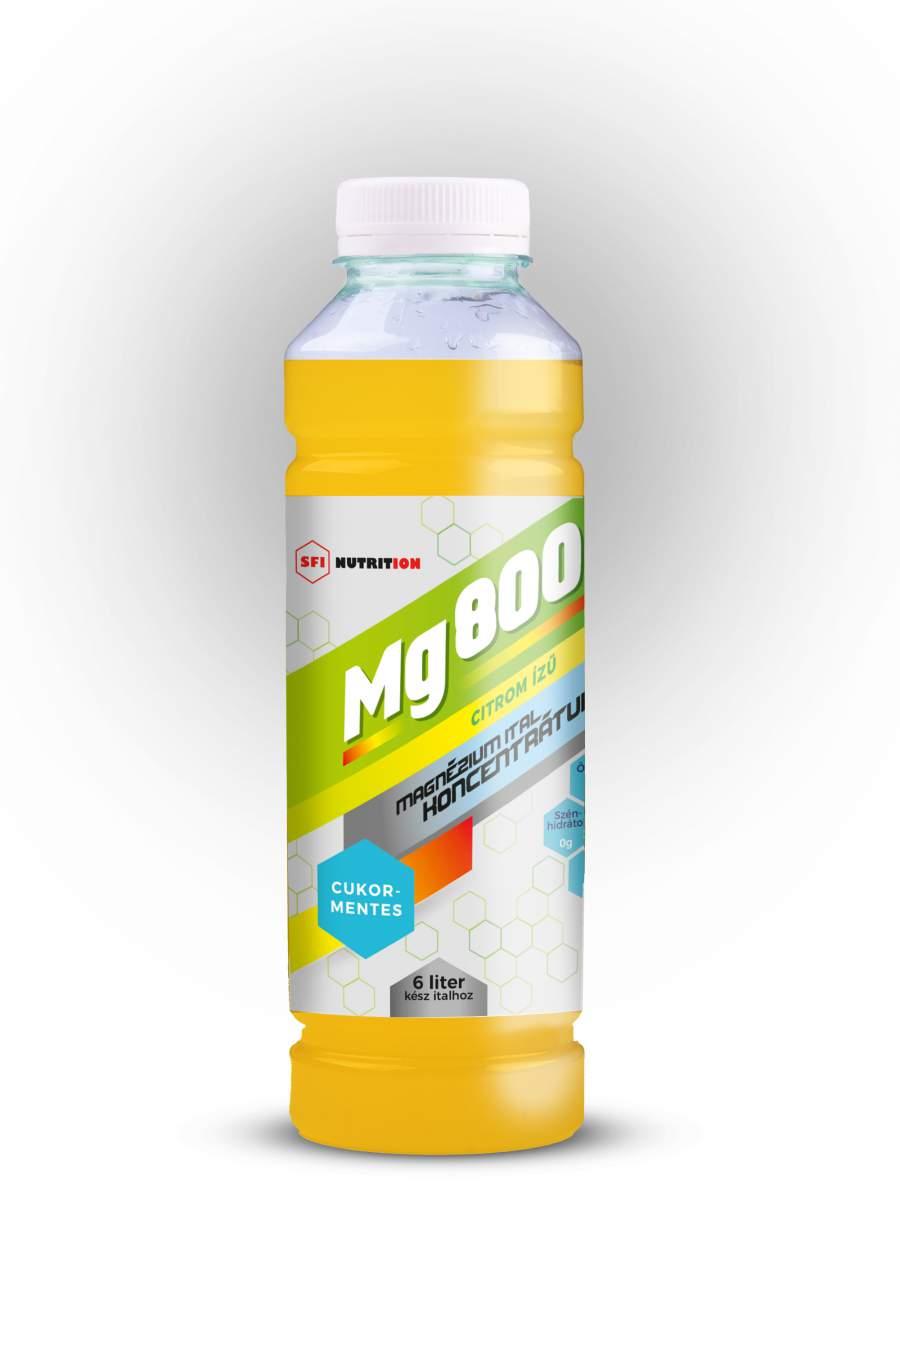 Mg 800 cukormentes magnézium koncentrátum citromos ízű